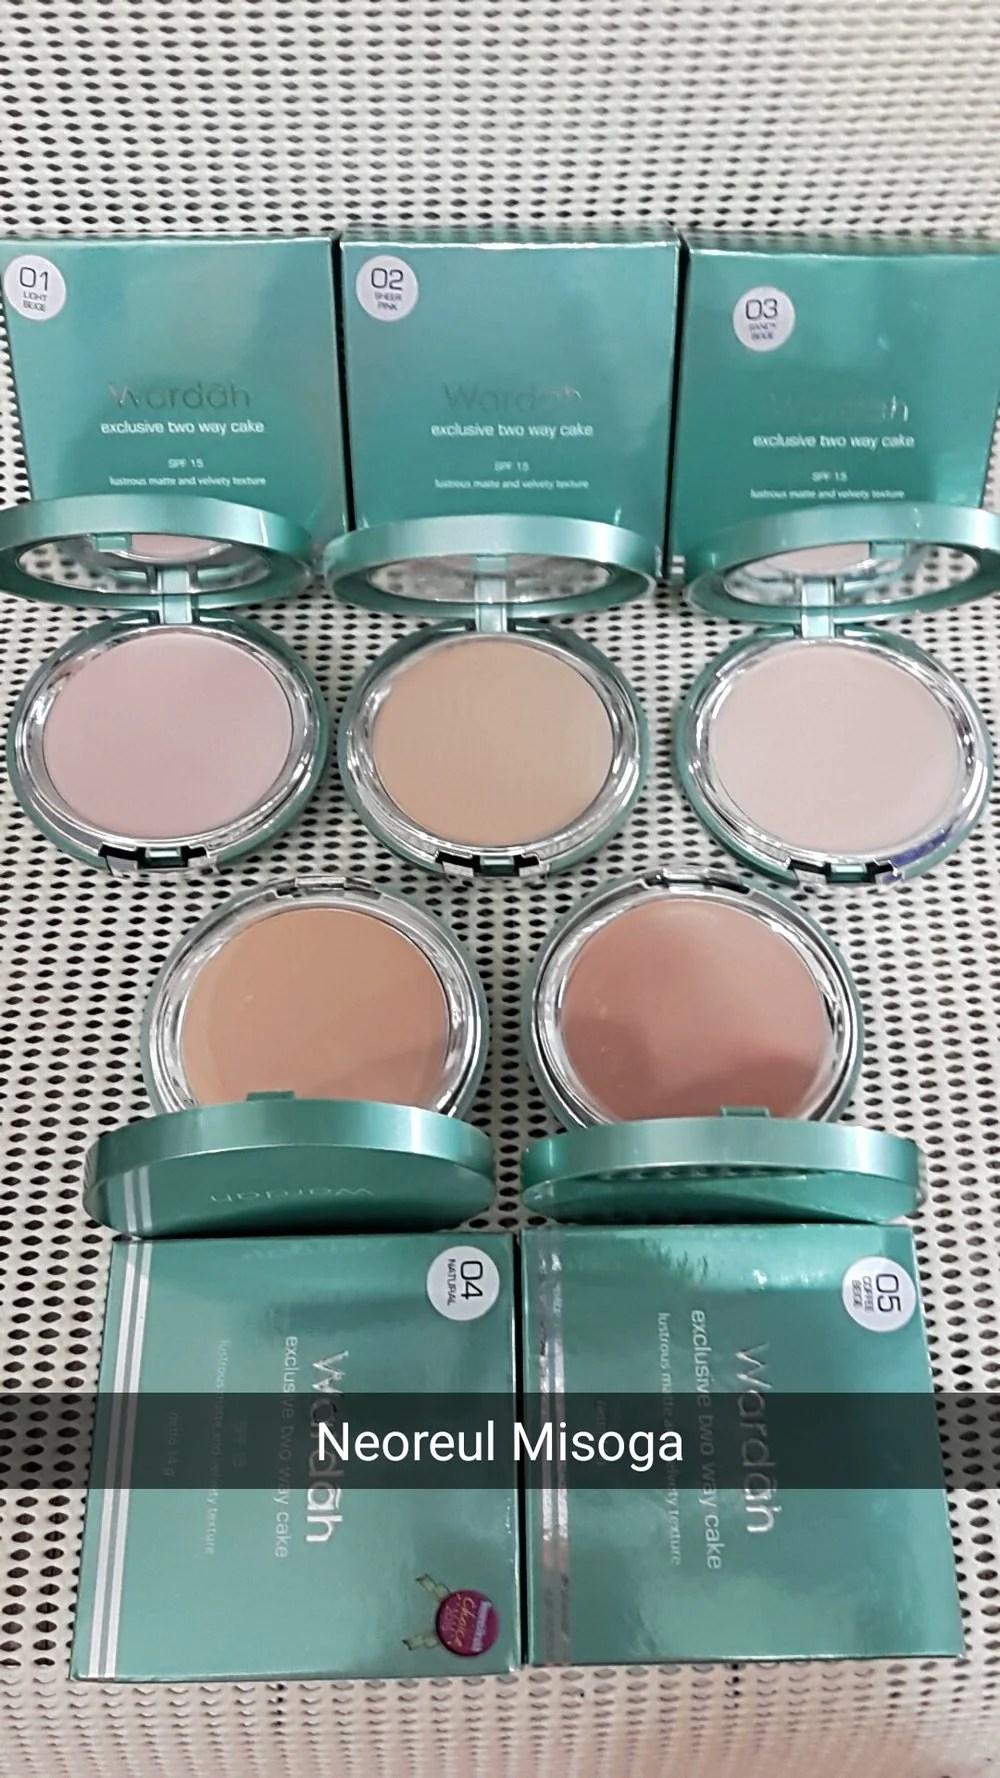 Warna Bedak Wardah : warna, bedak, wardah, Beauty, Matte, Cream, Halal, Cosmetics, Australia